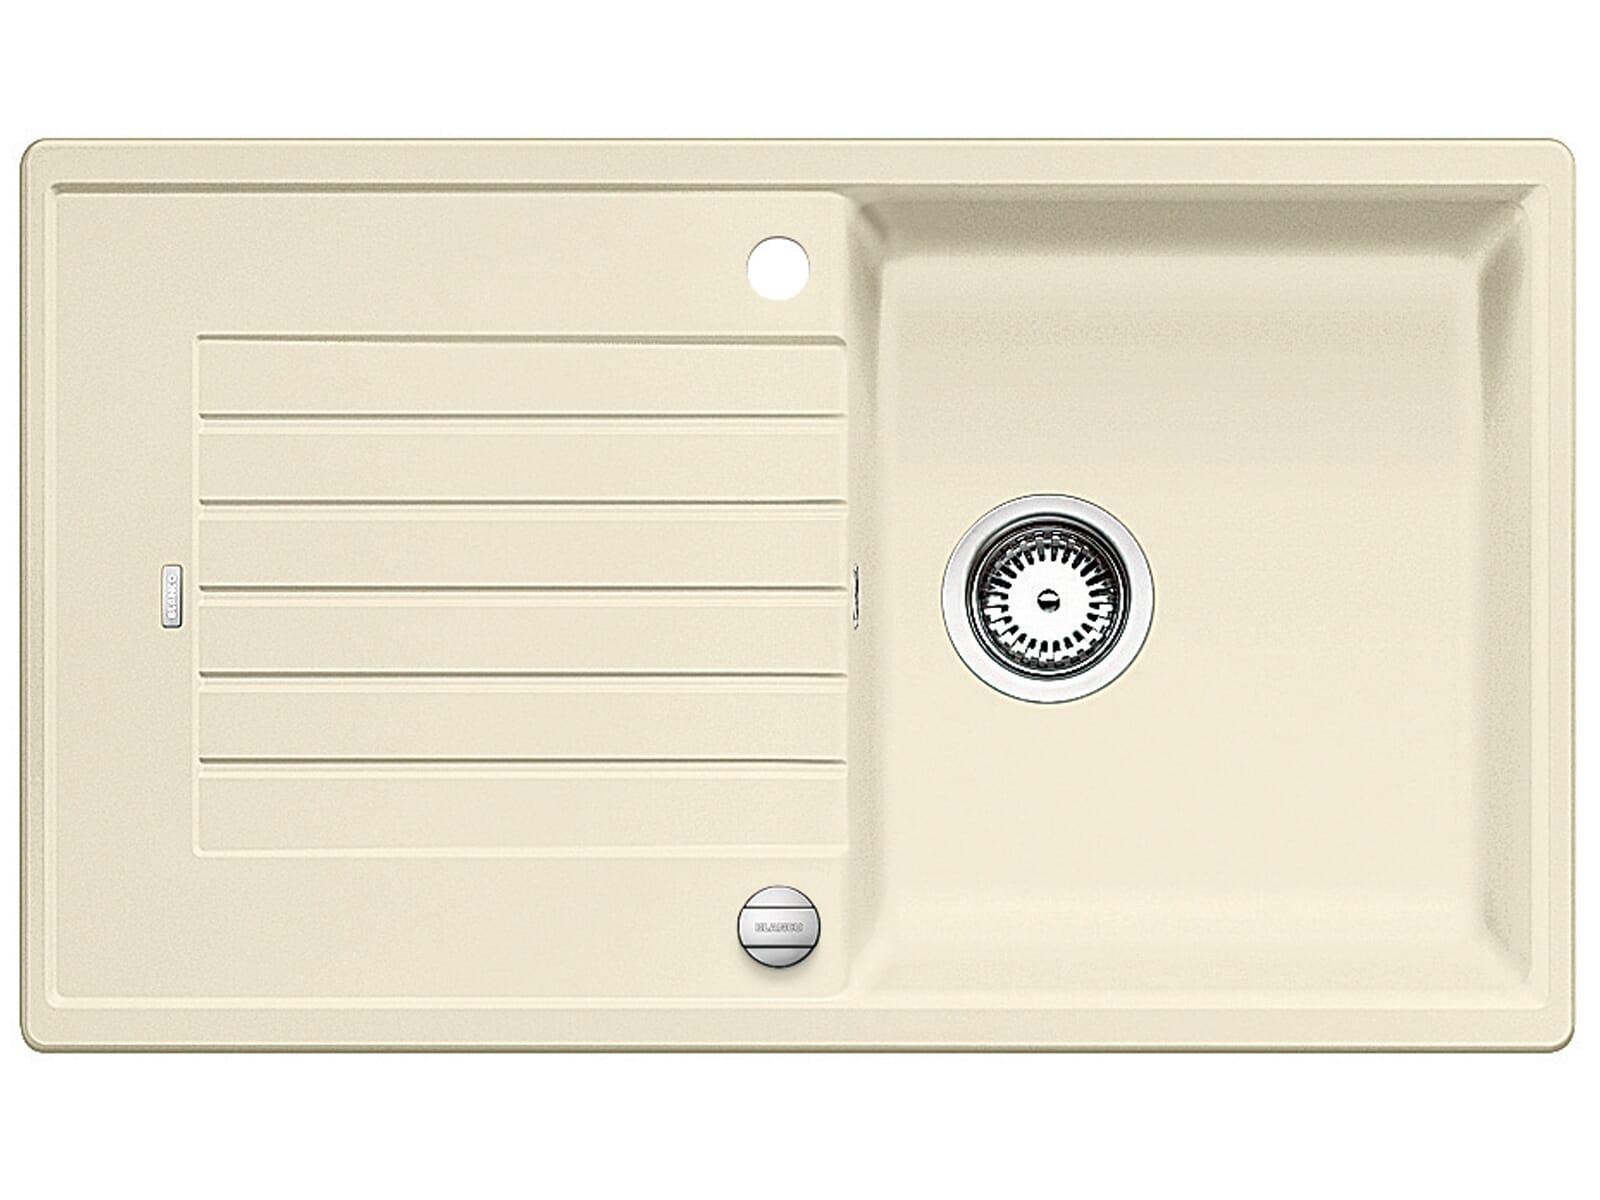 Blanco Zia 5 S Jasmin - 520 507 Granitspüle